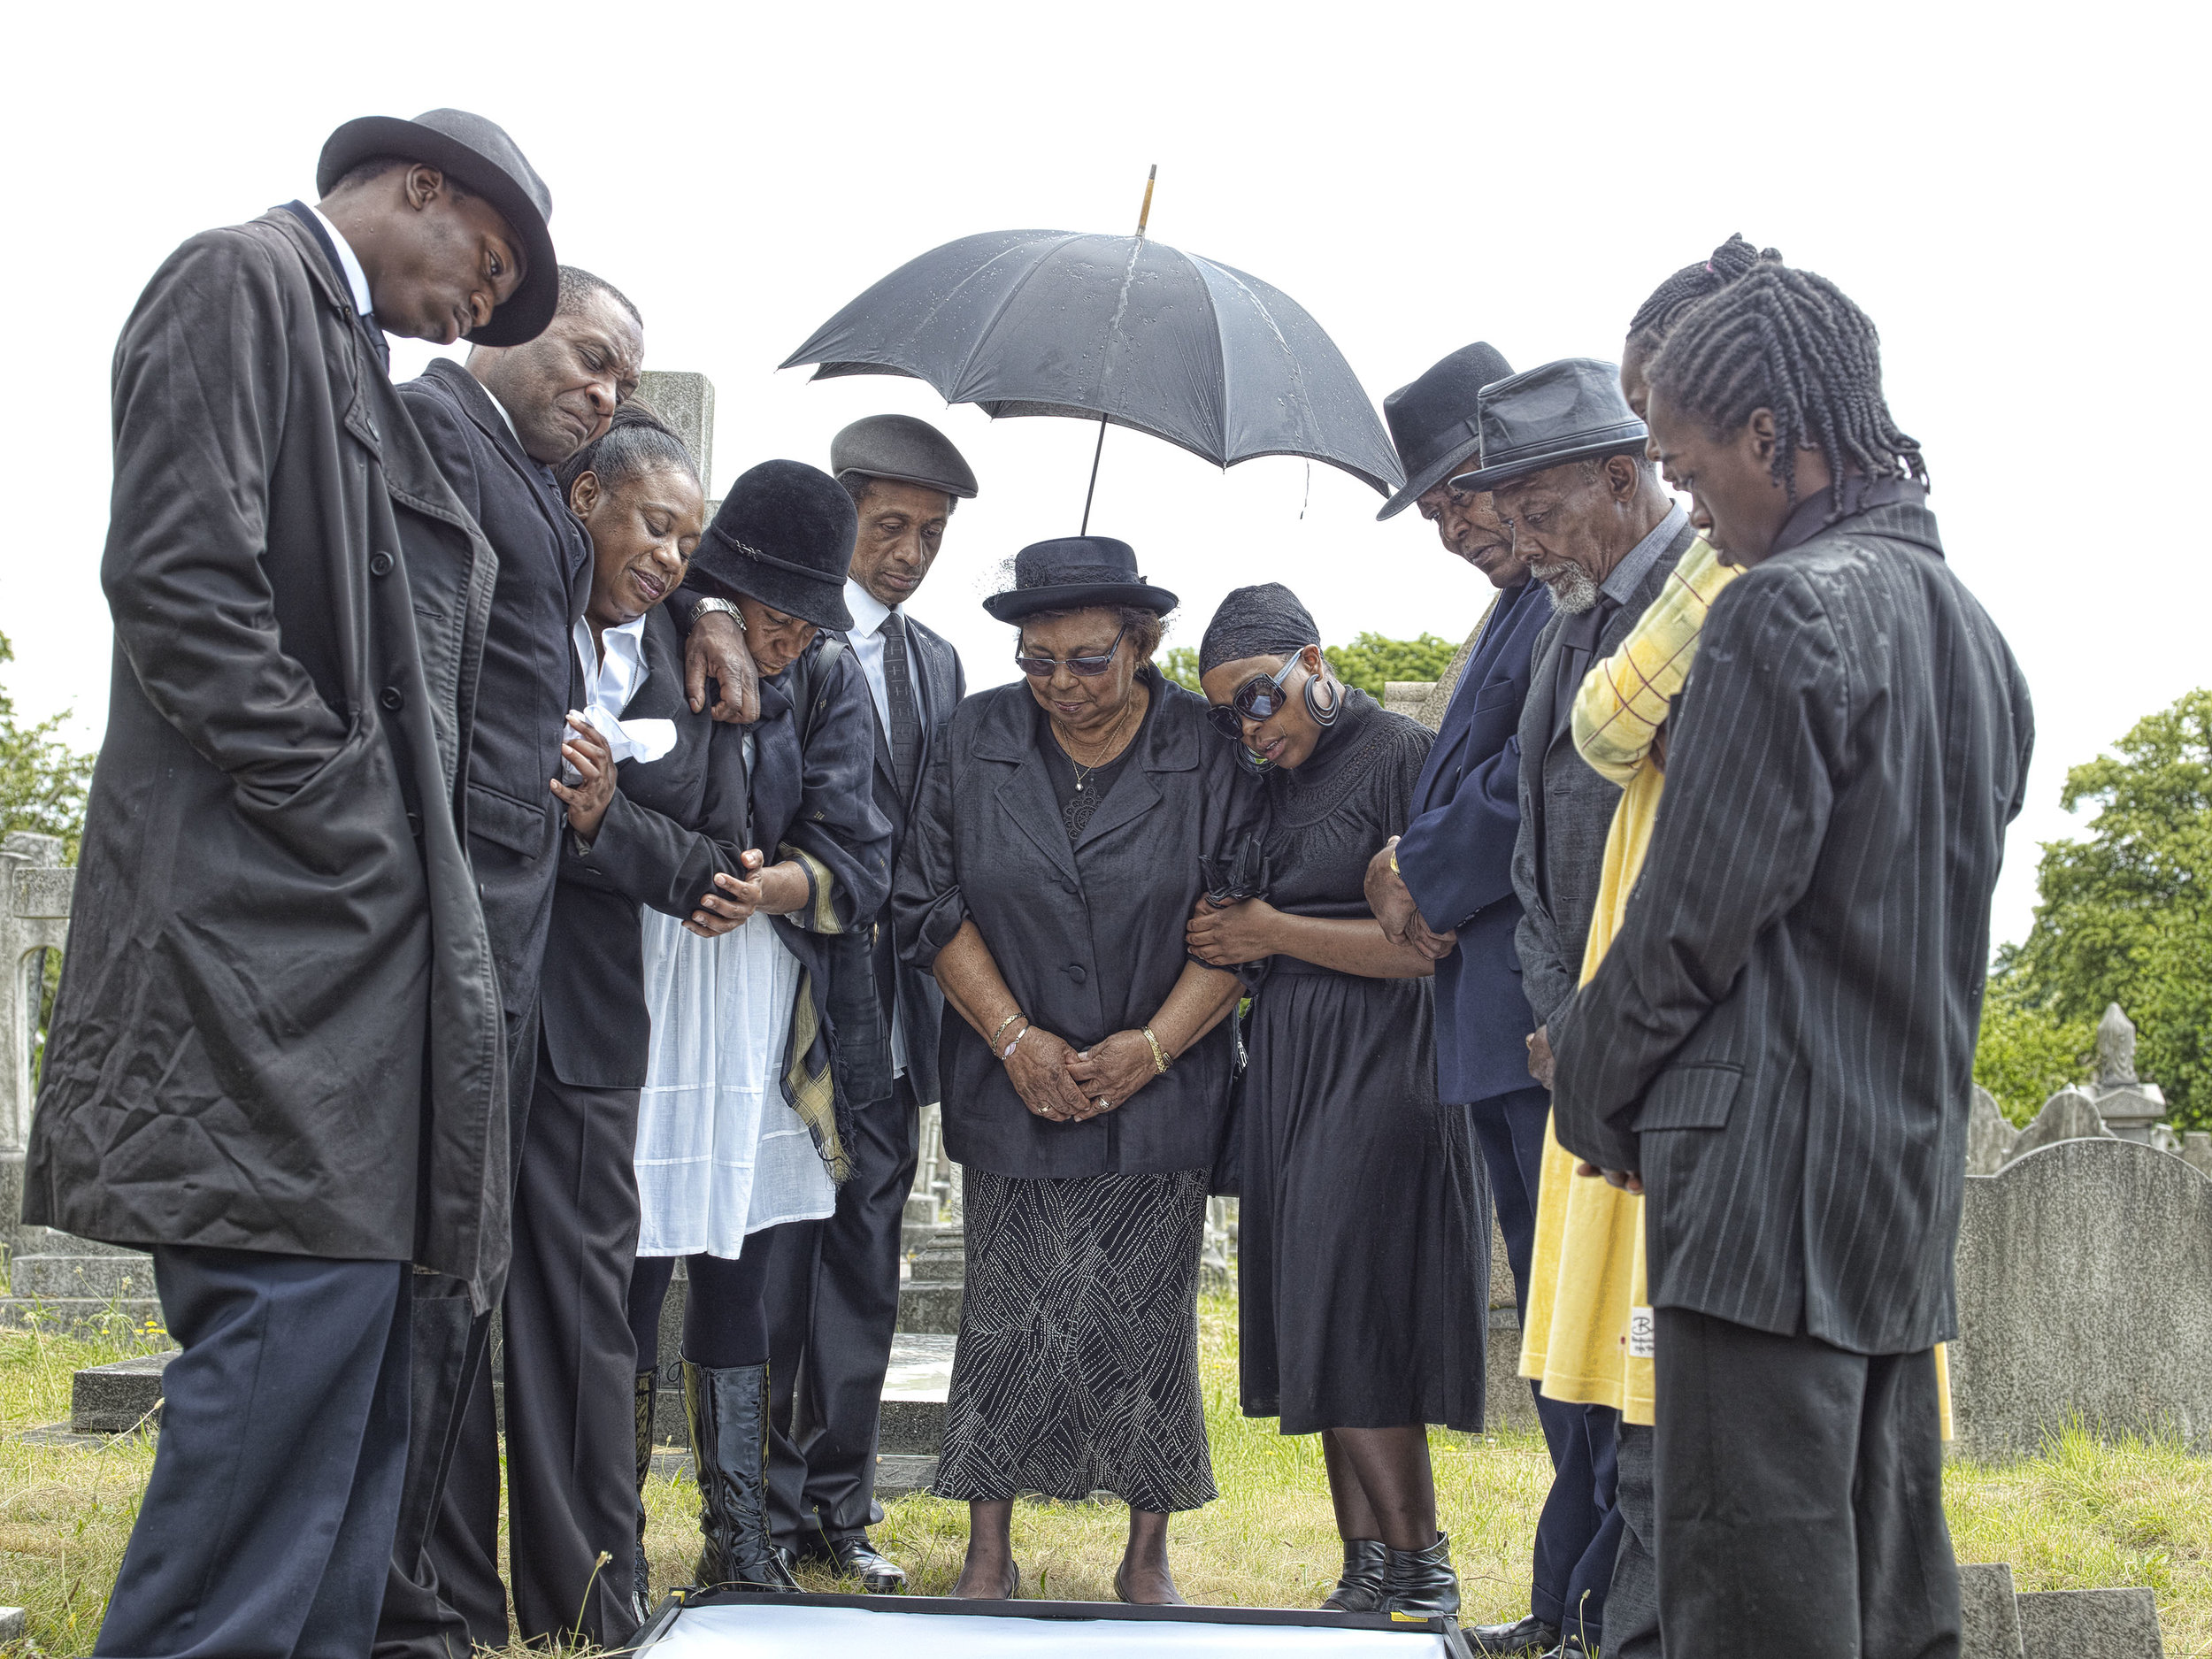 Funeral Shoot-By John Ferguson